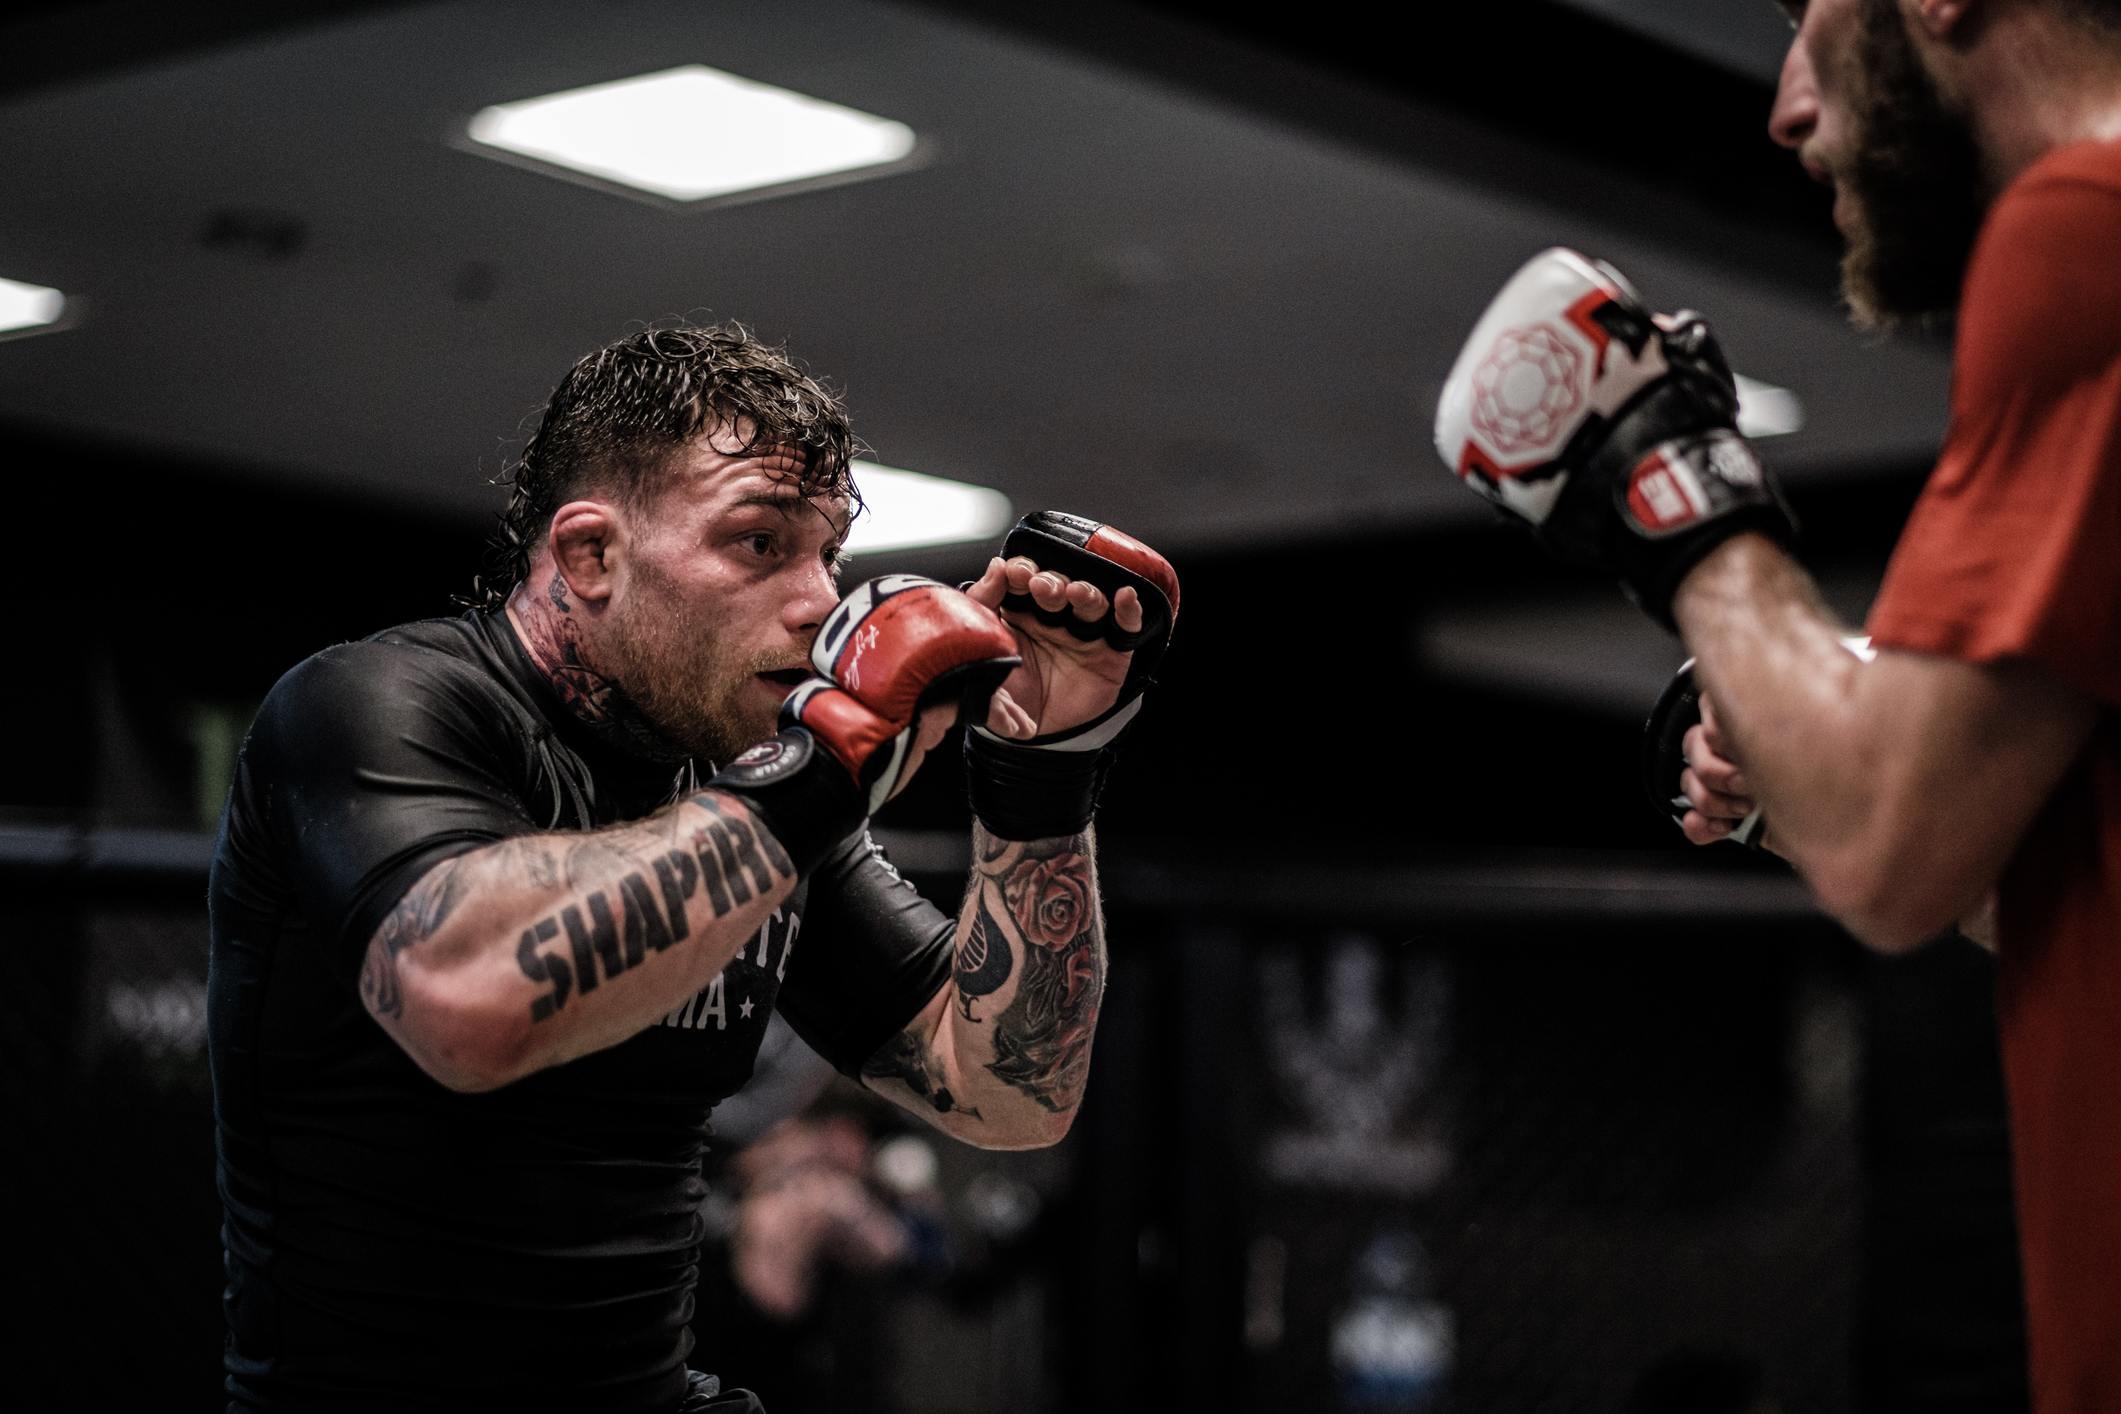 MMA fighter instincts, training